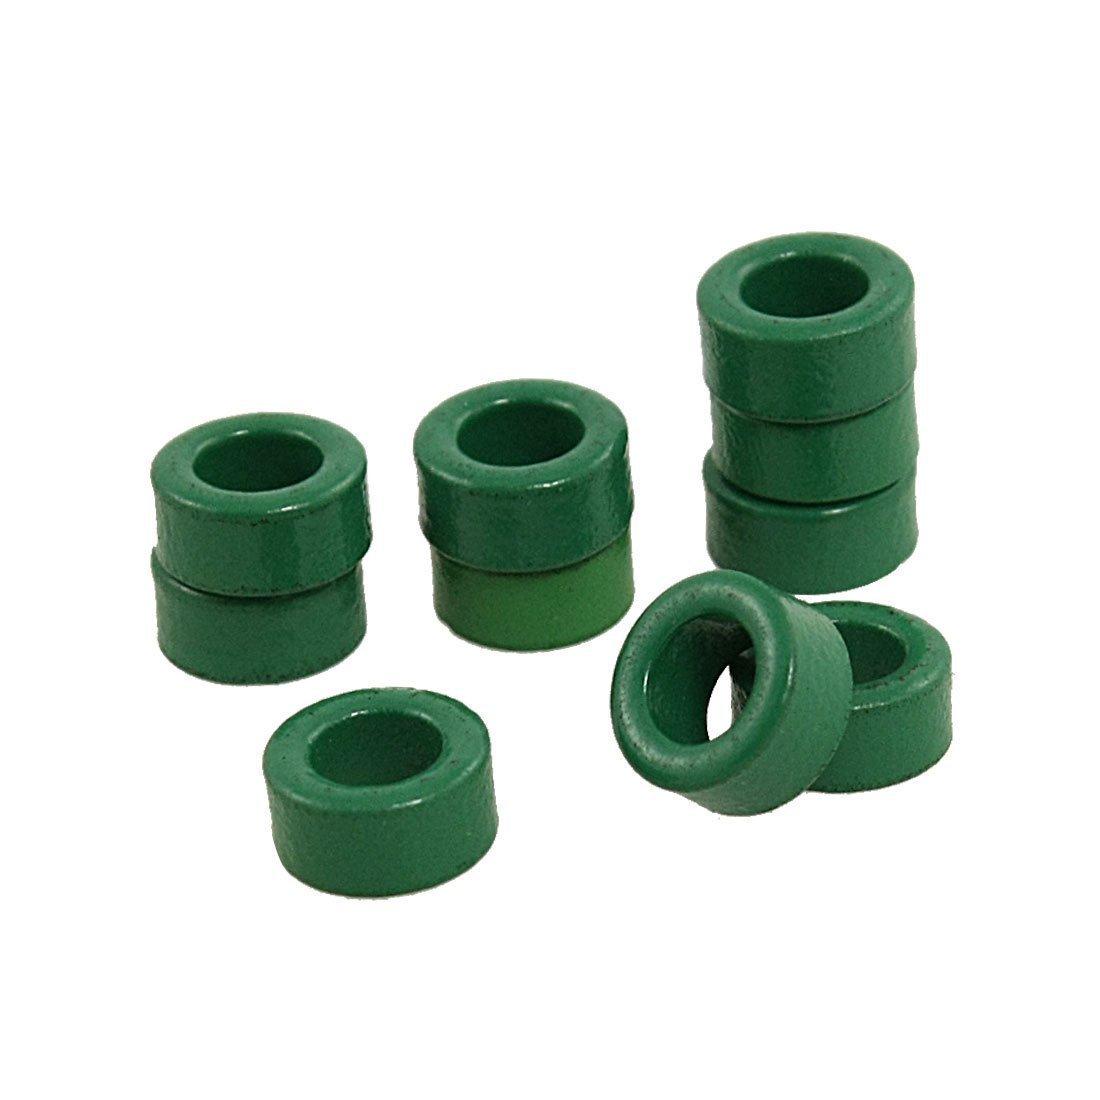 SODIAL 10 Pcs Inductor Coils Green Toroid Ferrite Cores 10mm x 6mm x 5mm